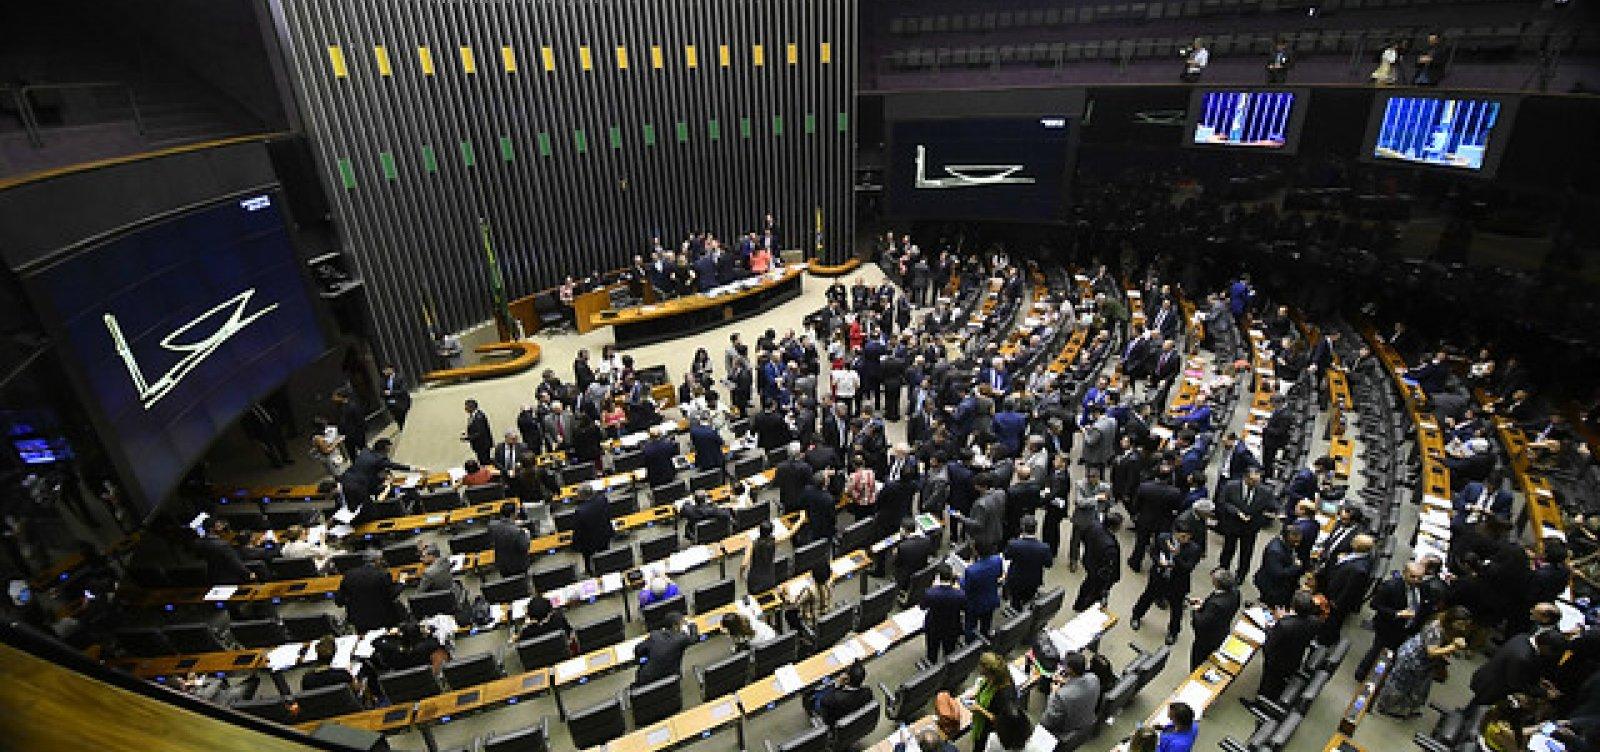 [Congresso derruba 18 vetos de Bolsonaro à lei de abuso de autoridade]